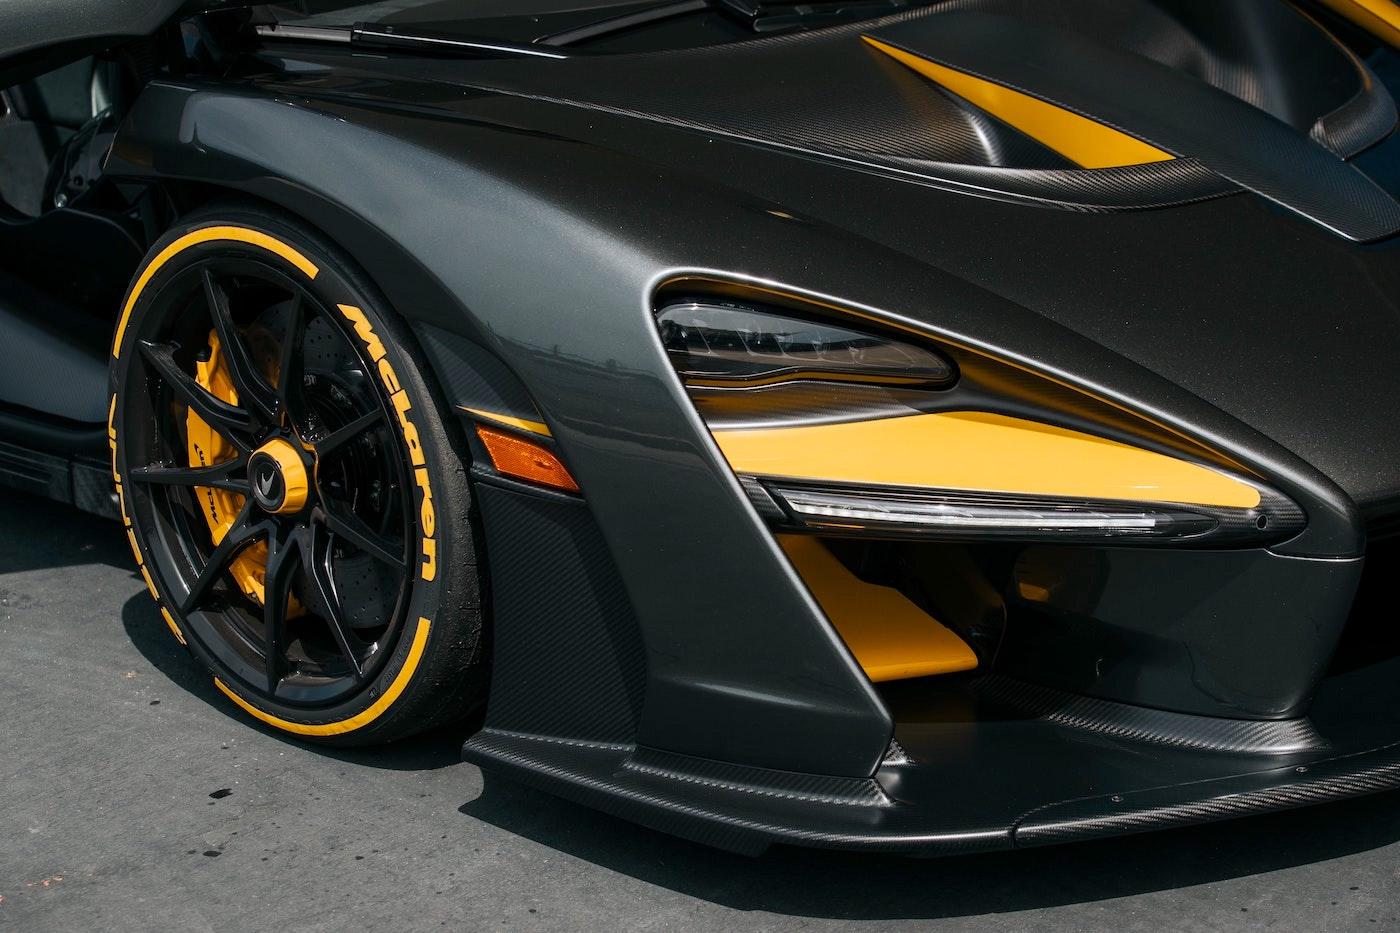 Close up of sports car